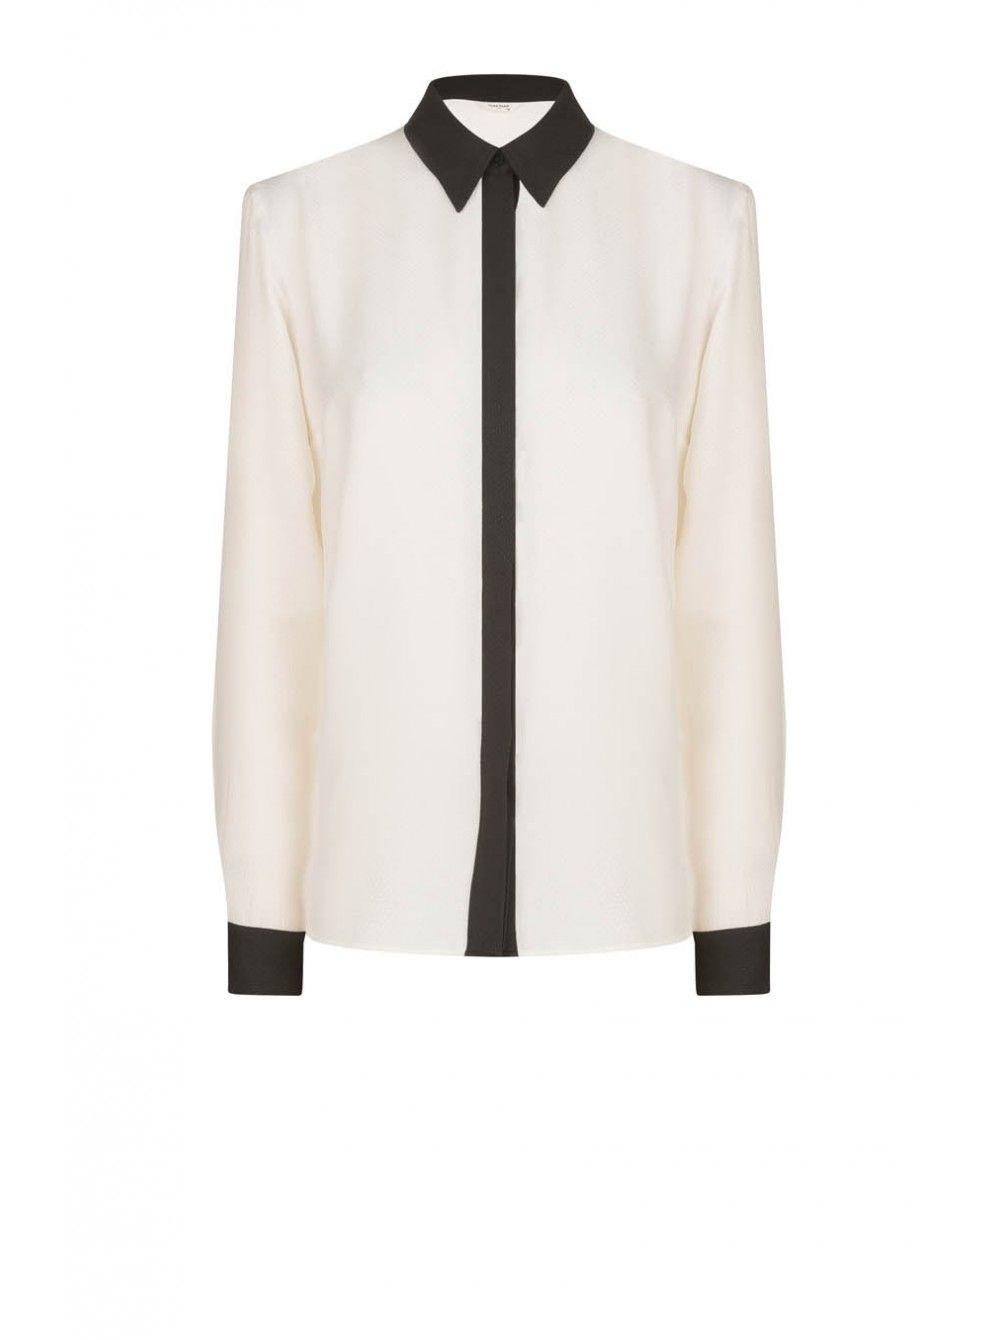 Naf naf nouvelle co h15 chemise bicolore ecru/noir 1